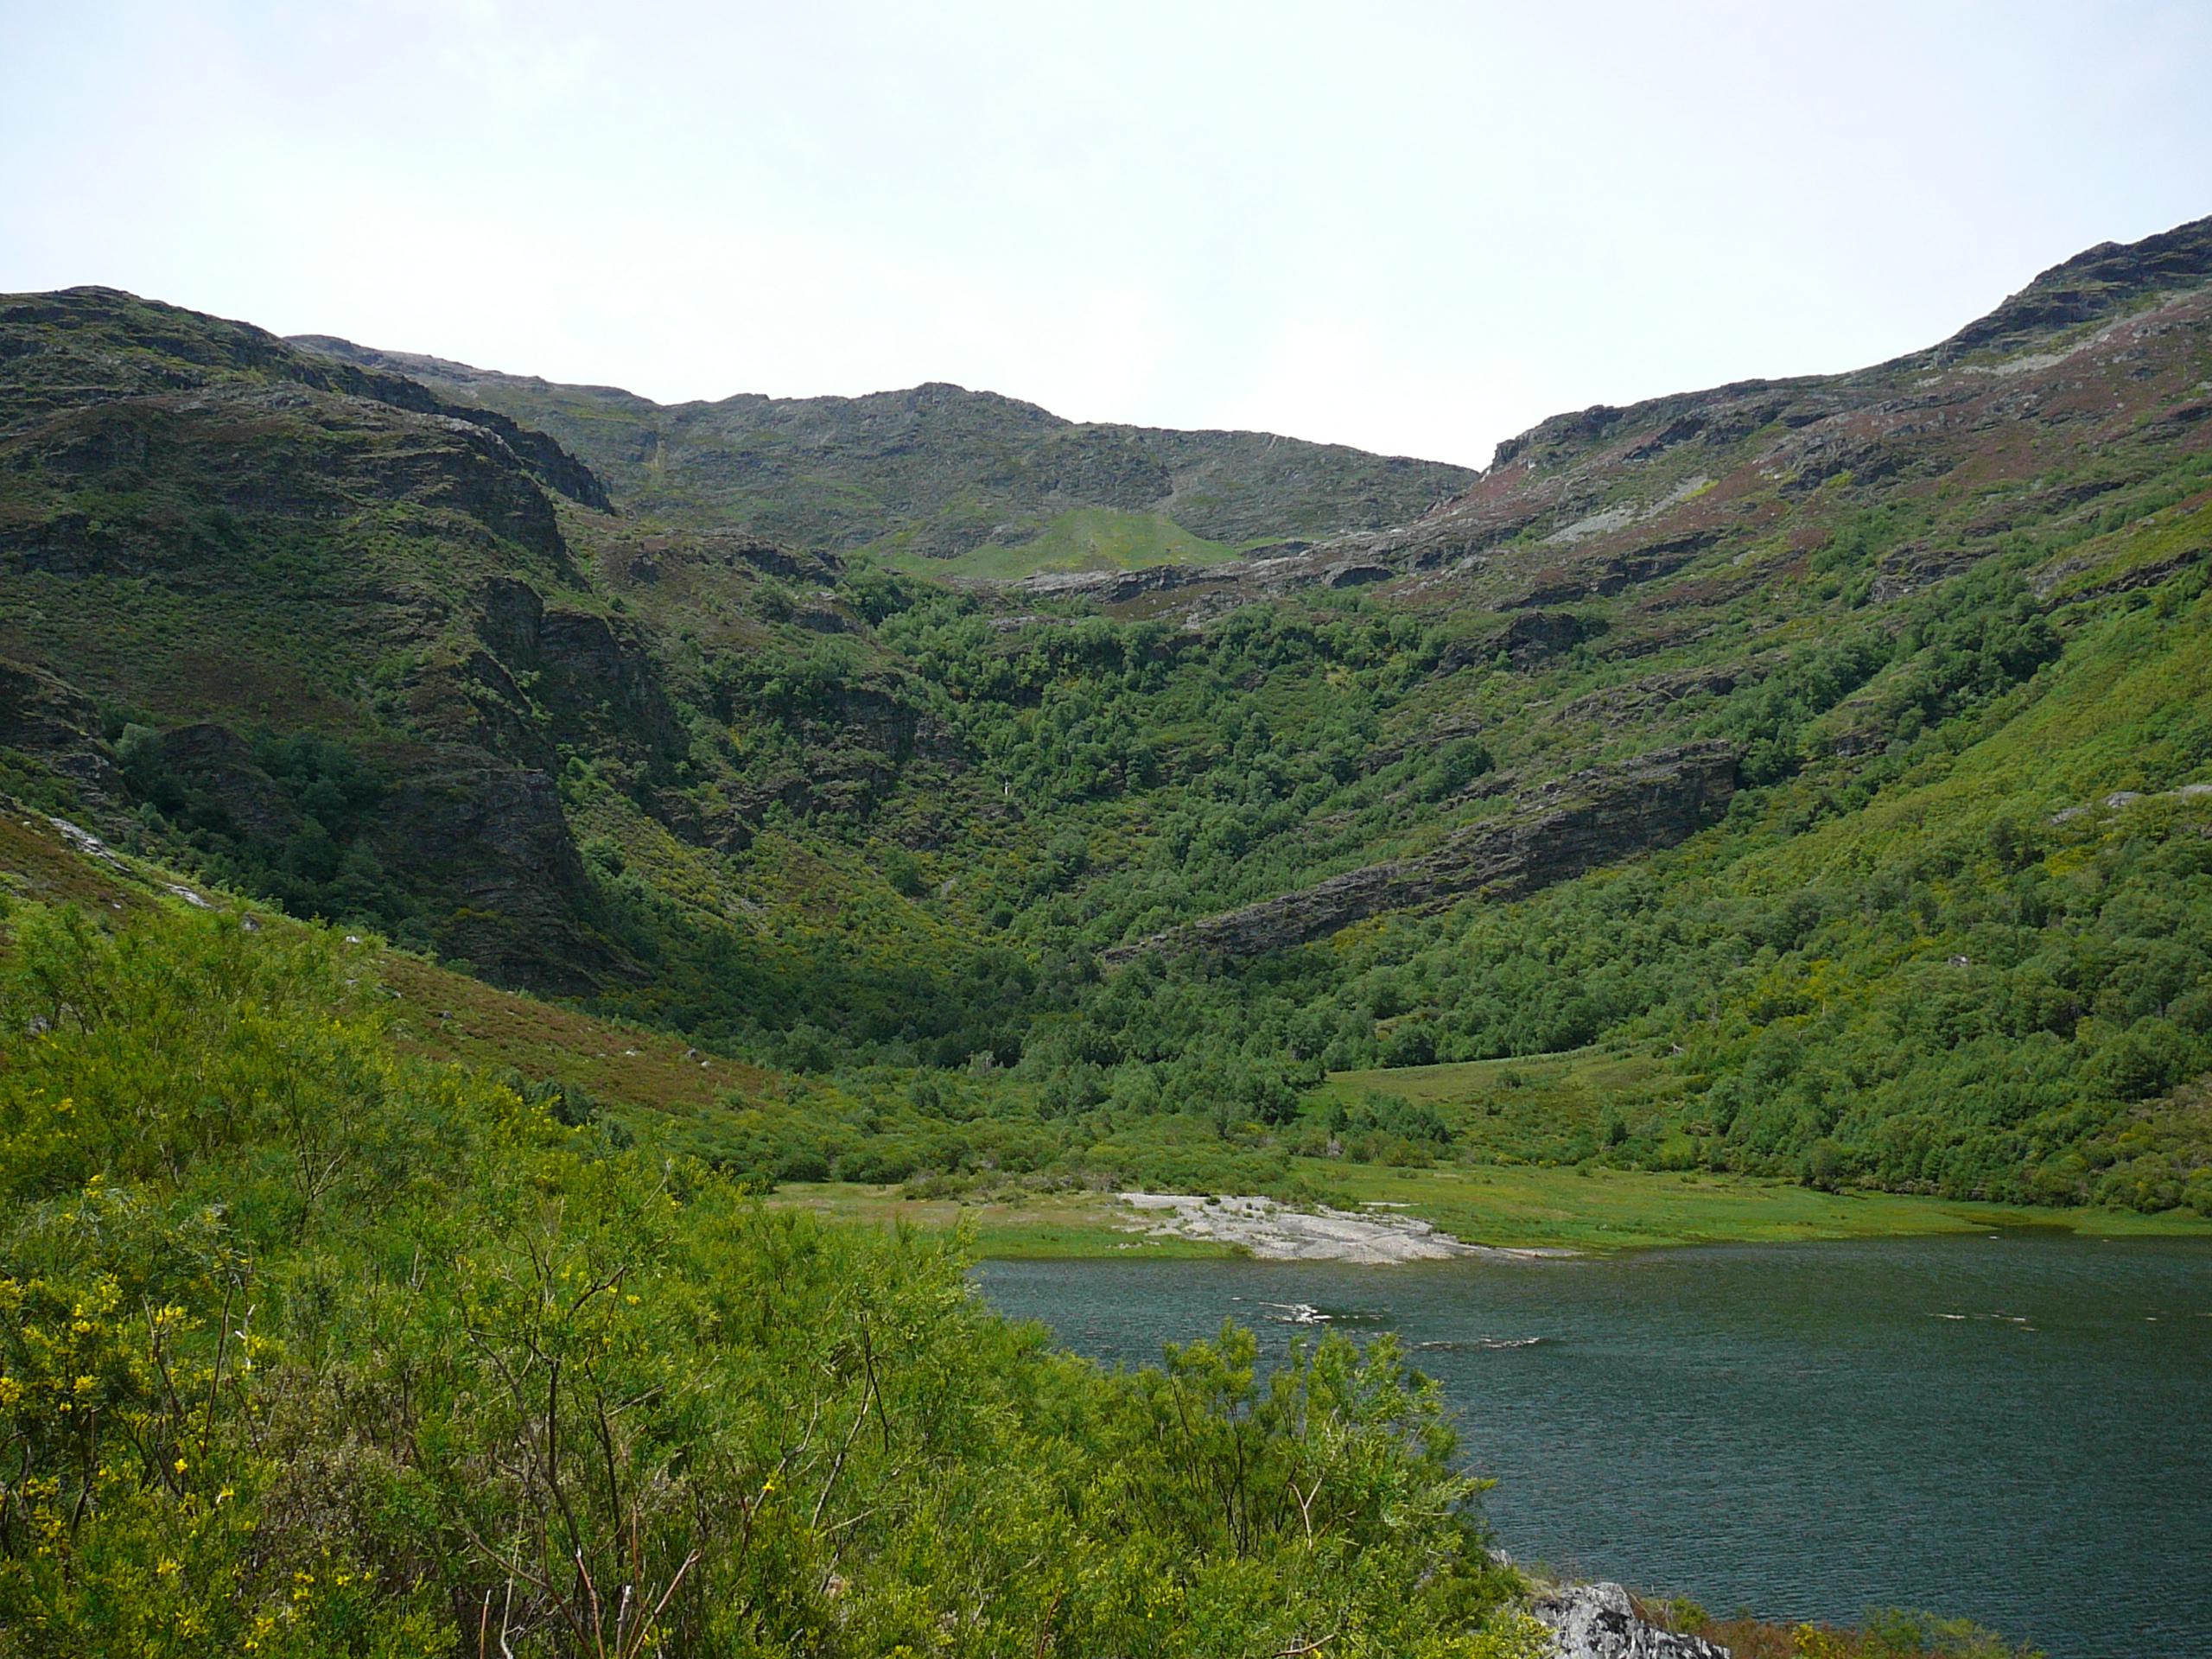 Monumento Natural 'Lago de la Baña'